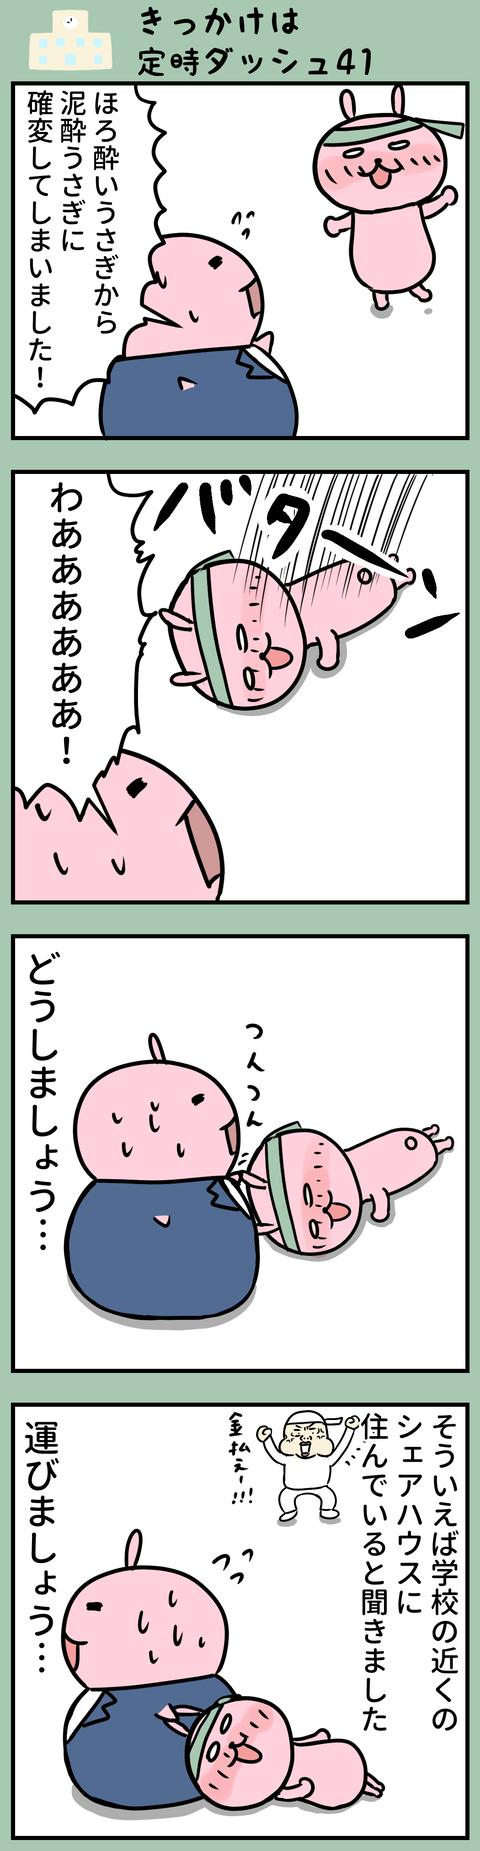 manga-yuzuporo111-1